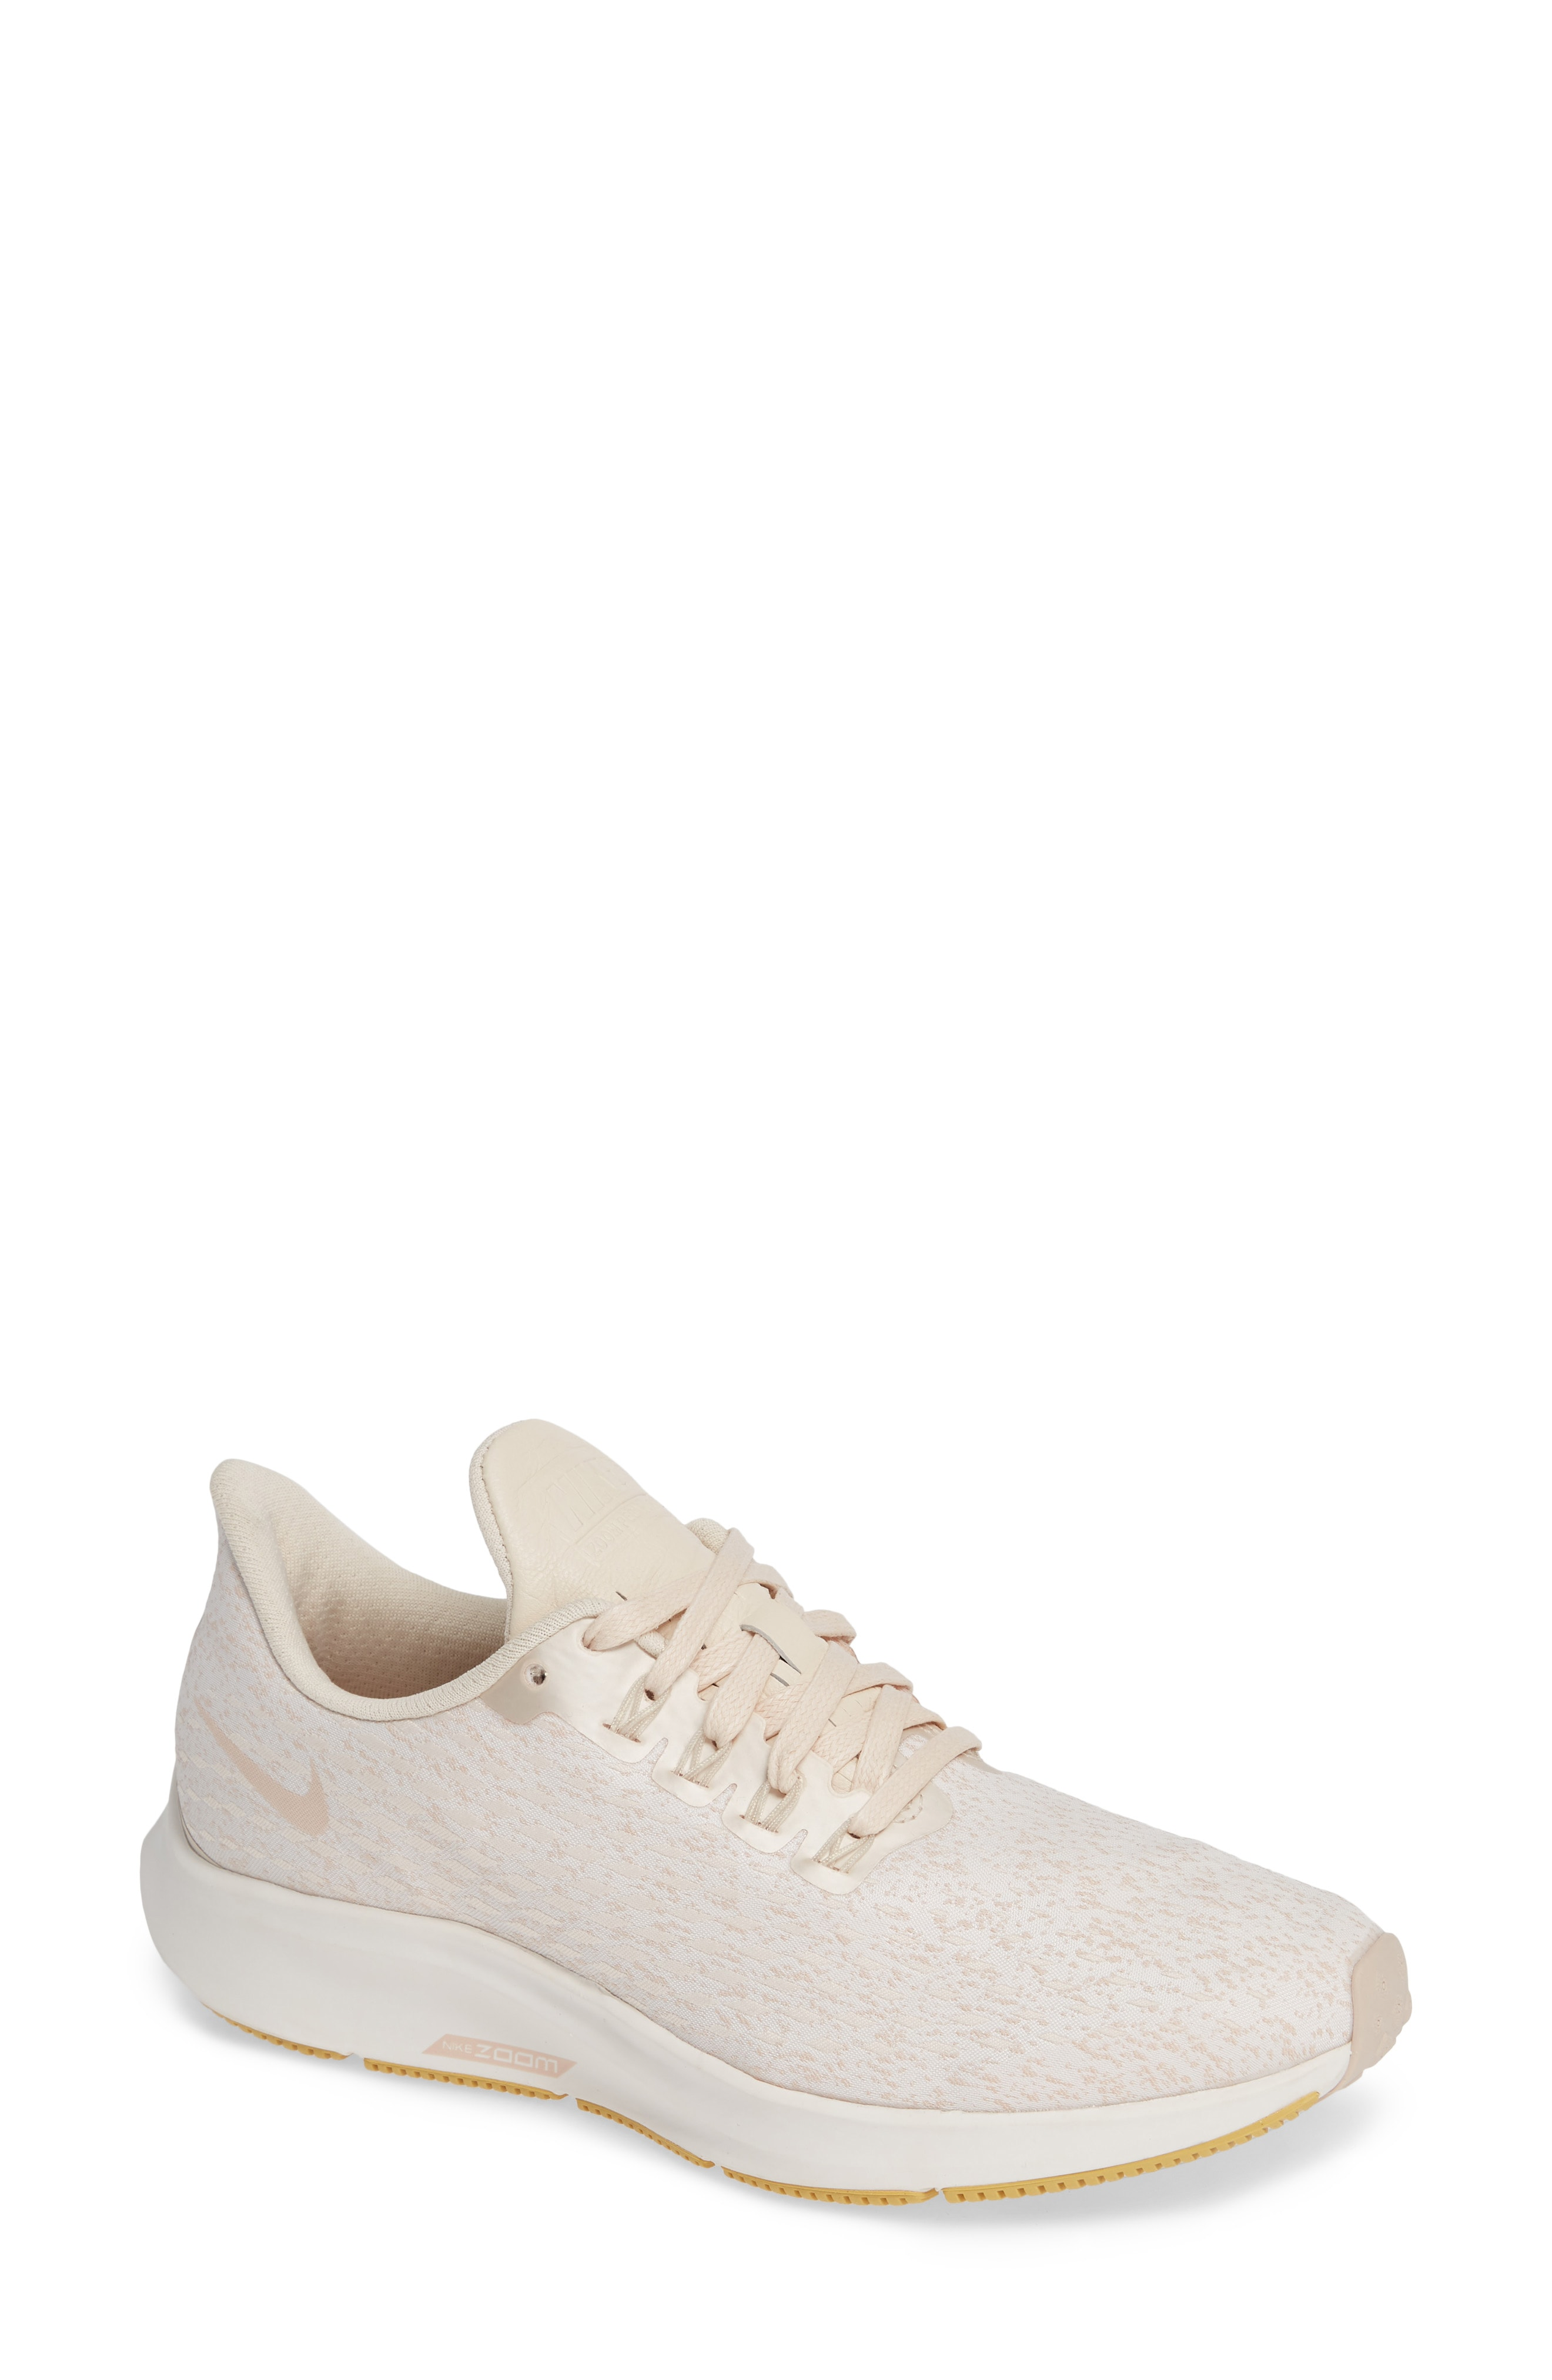 Nike Air Zoom Pegasus 35 Premium Running Shoe (Women)